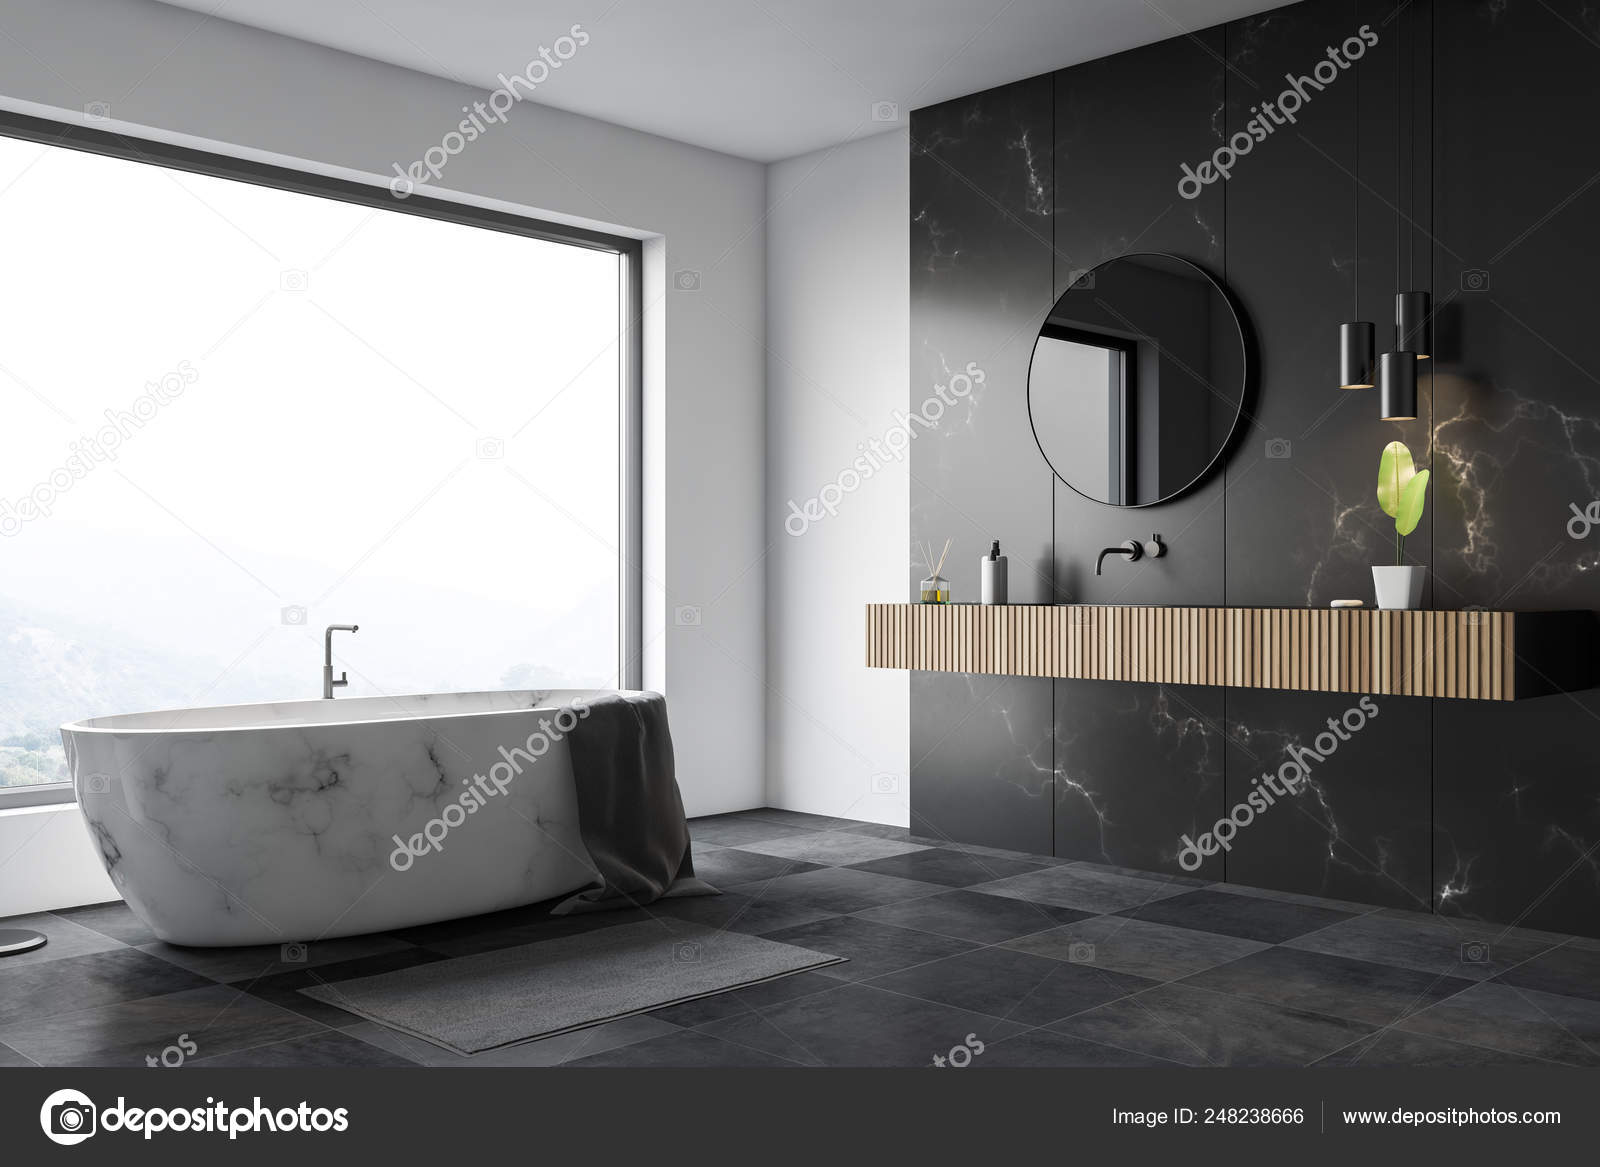 White And Black Marble Bathroom Corner Tub Sink Stock Photo C Denisismagilov 248238666